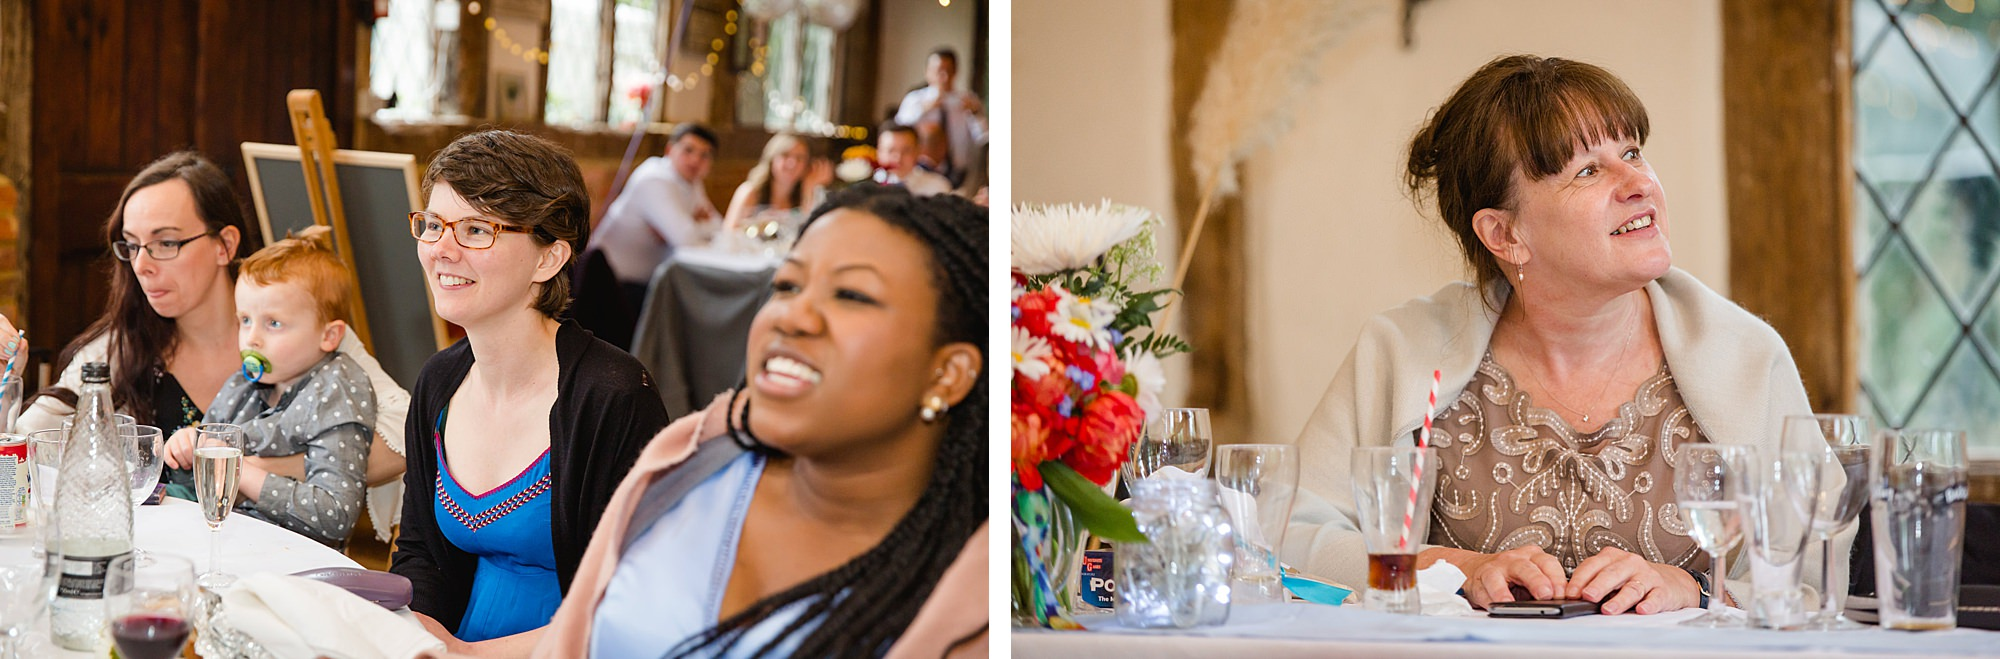 Fun DIY wedding guests listening to speeches